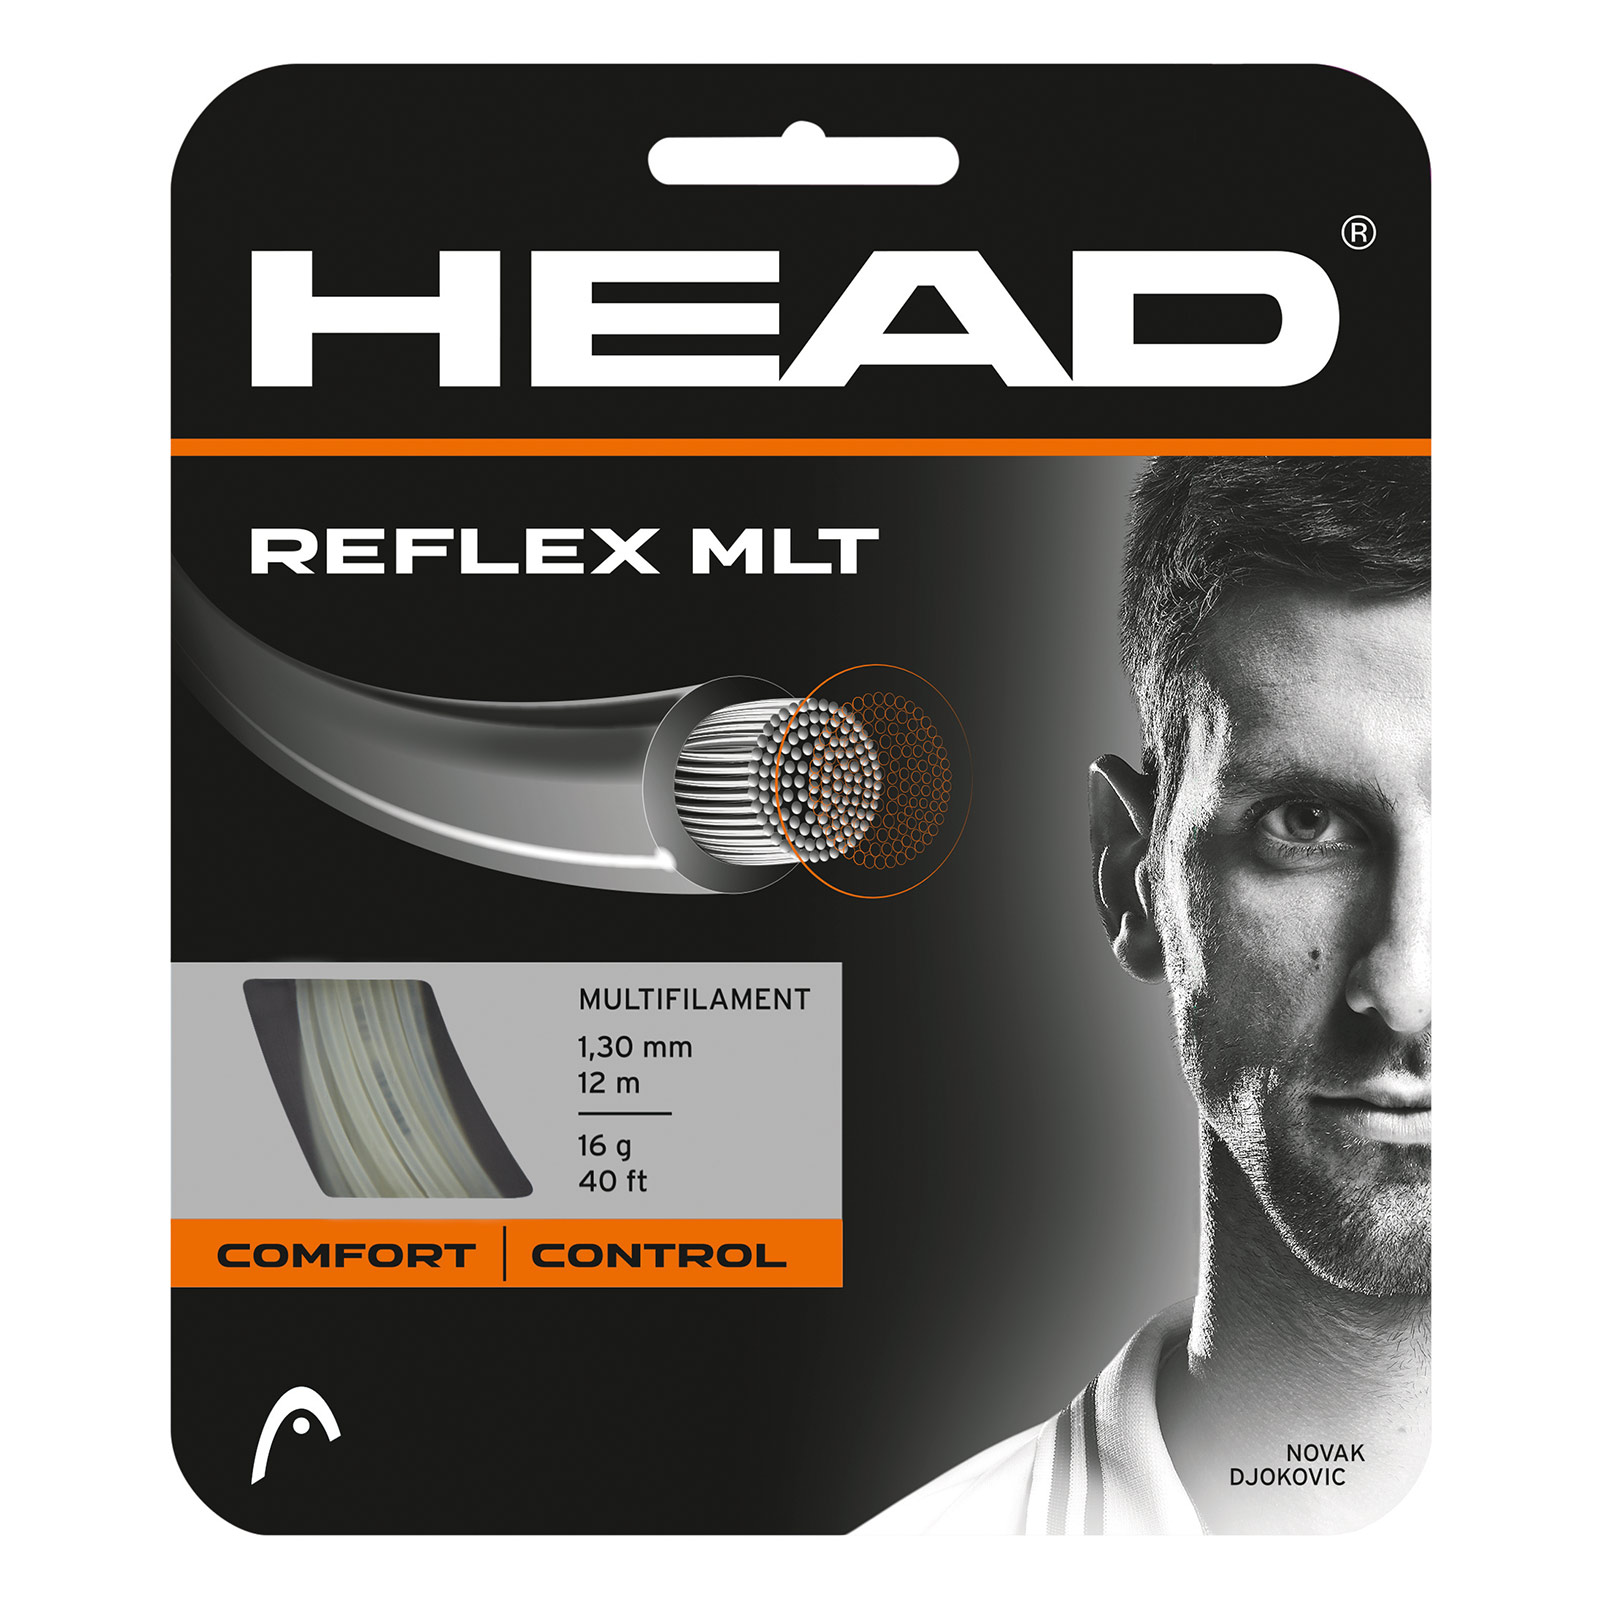 HEAD Reflex MLT 12m 1,25 Natural